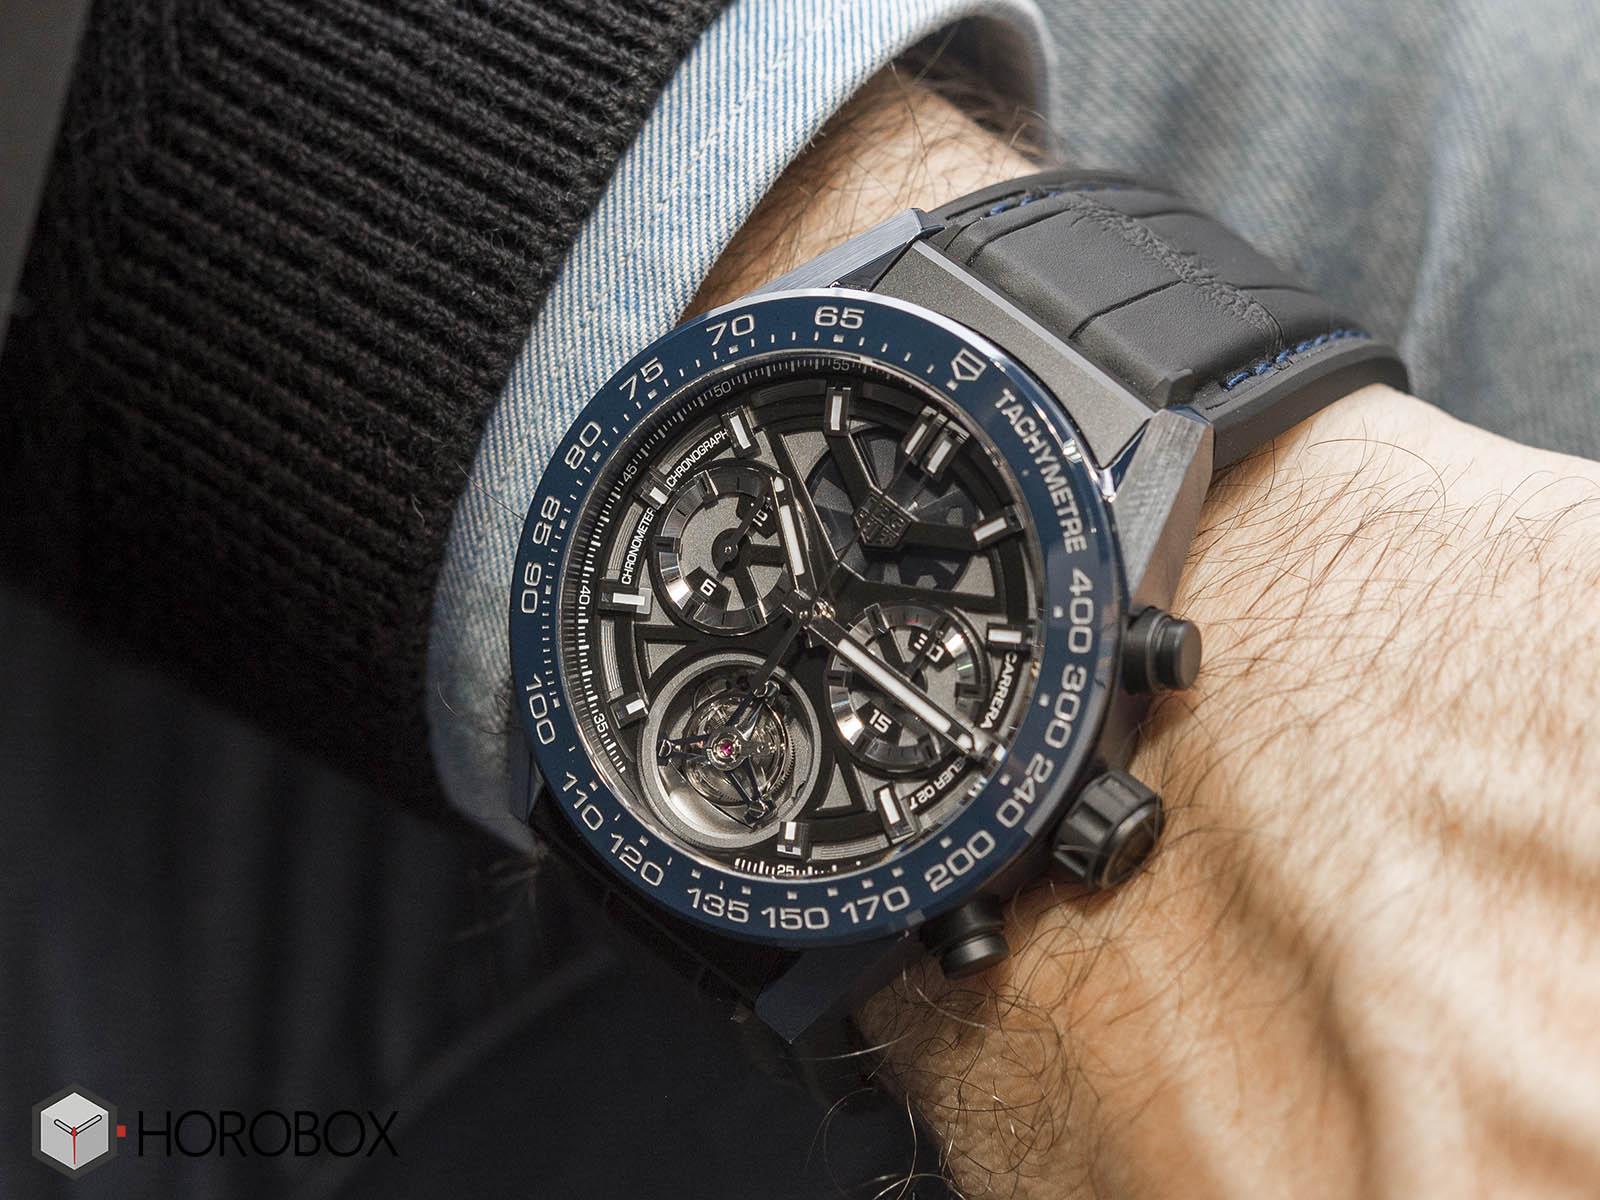 car5a93-fc6442-tag-heuer-carrera-chronograph-tourbillon-chronometer-10.jpg